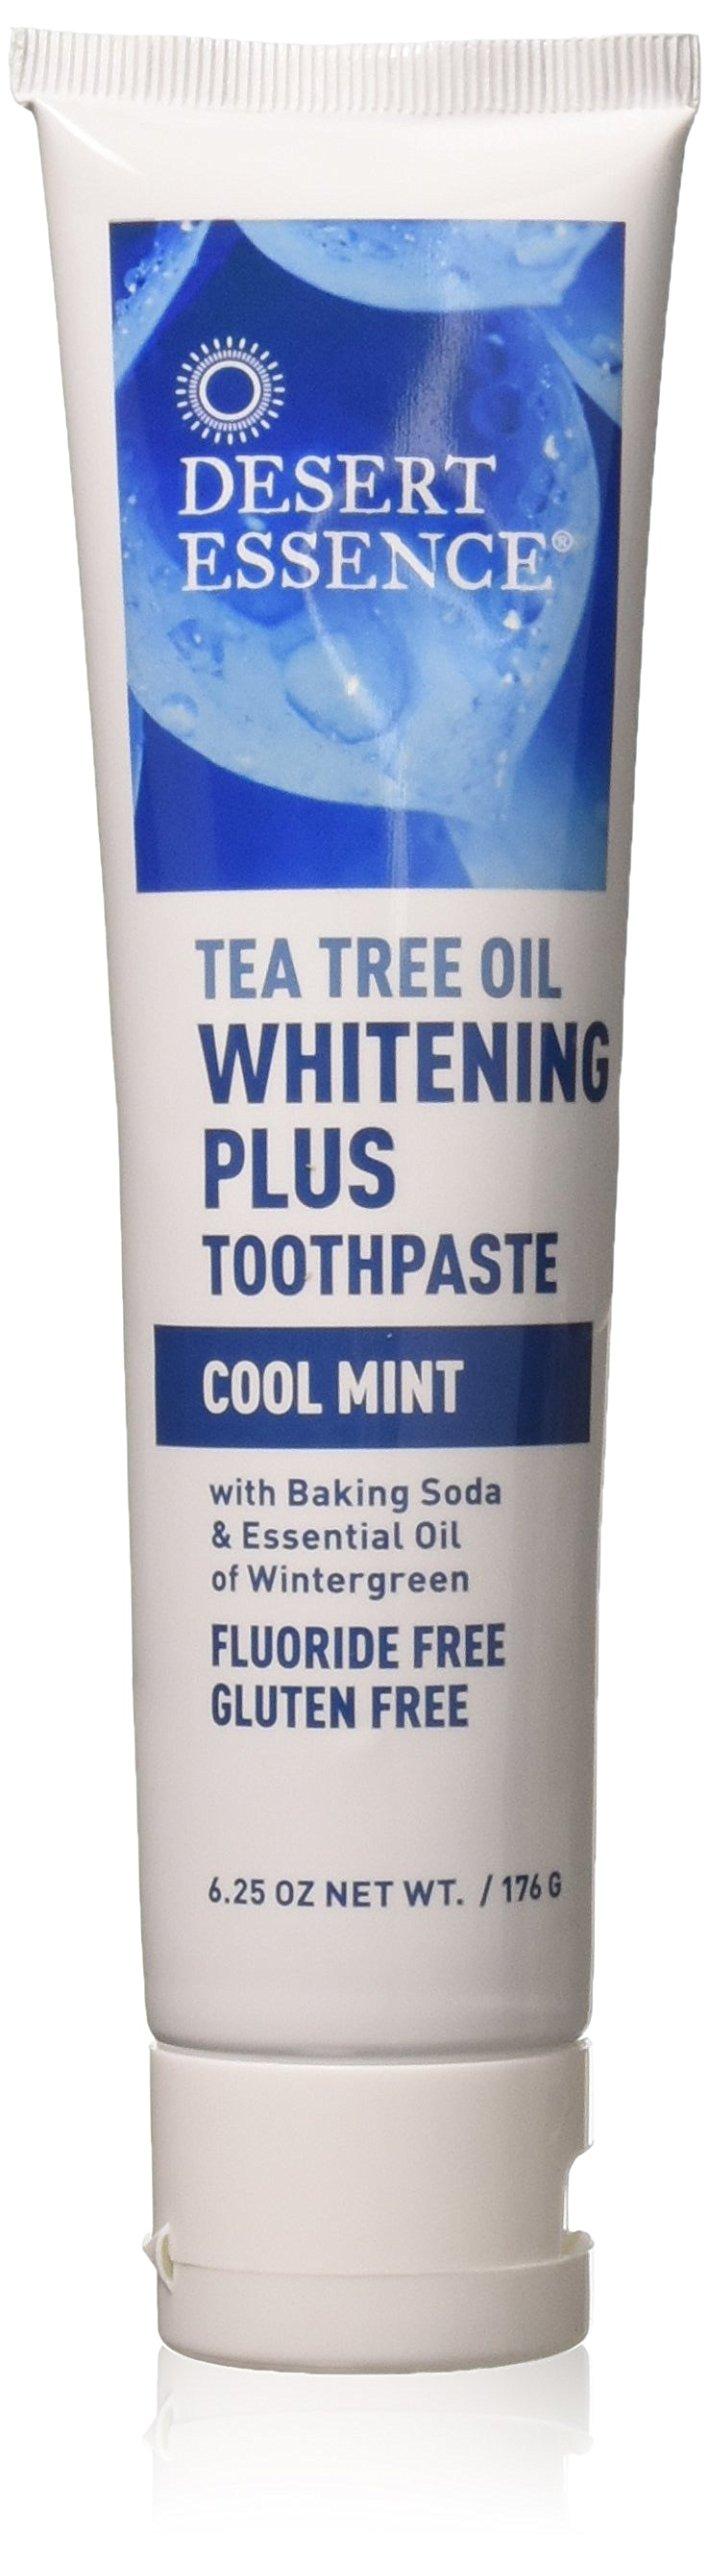 Desert Essence Whitening Plus Cool Mint Toothpaste - 6.25 oz